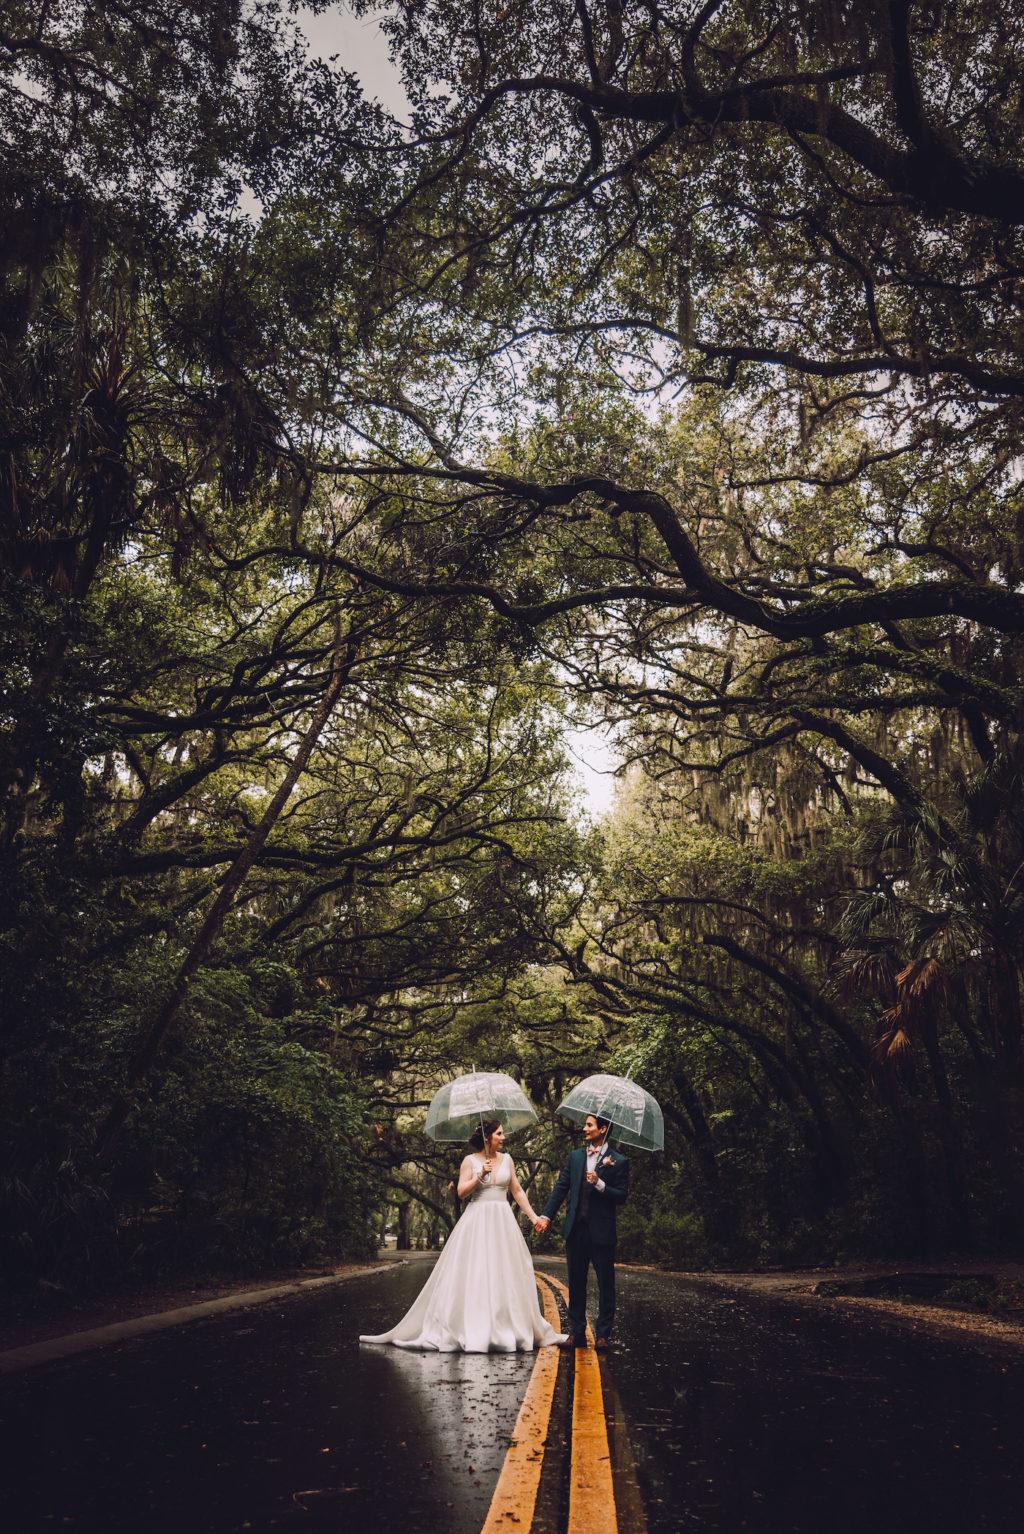 Bride and Groom Rainy Wedding Day Portrait with Clear Umbrellas | St. Petersburg Florida Wedding